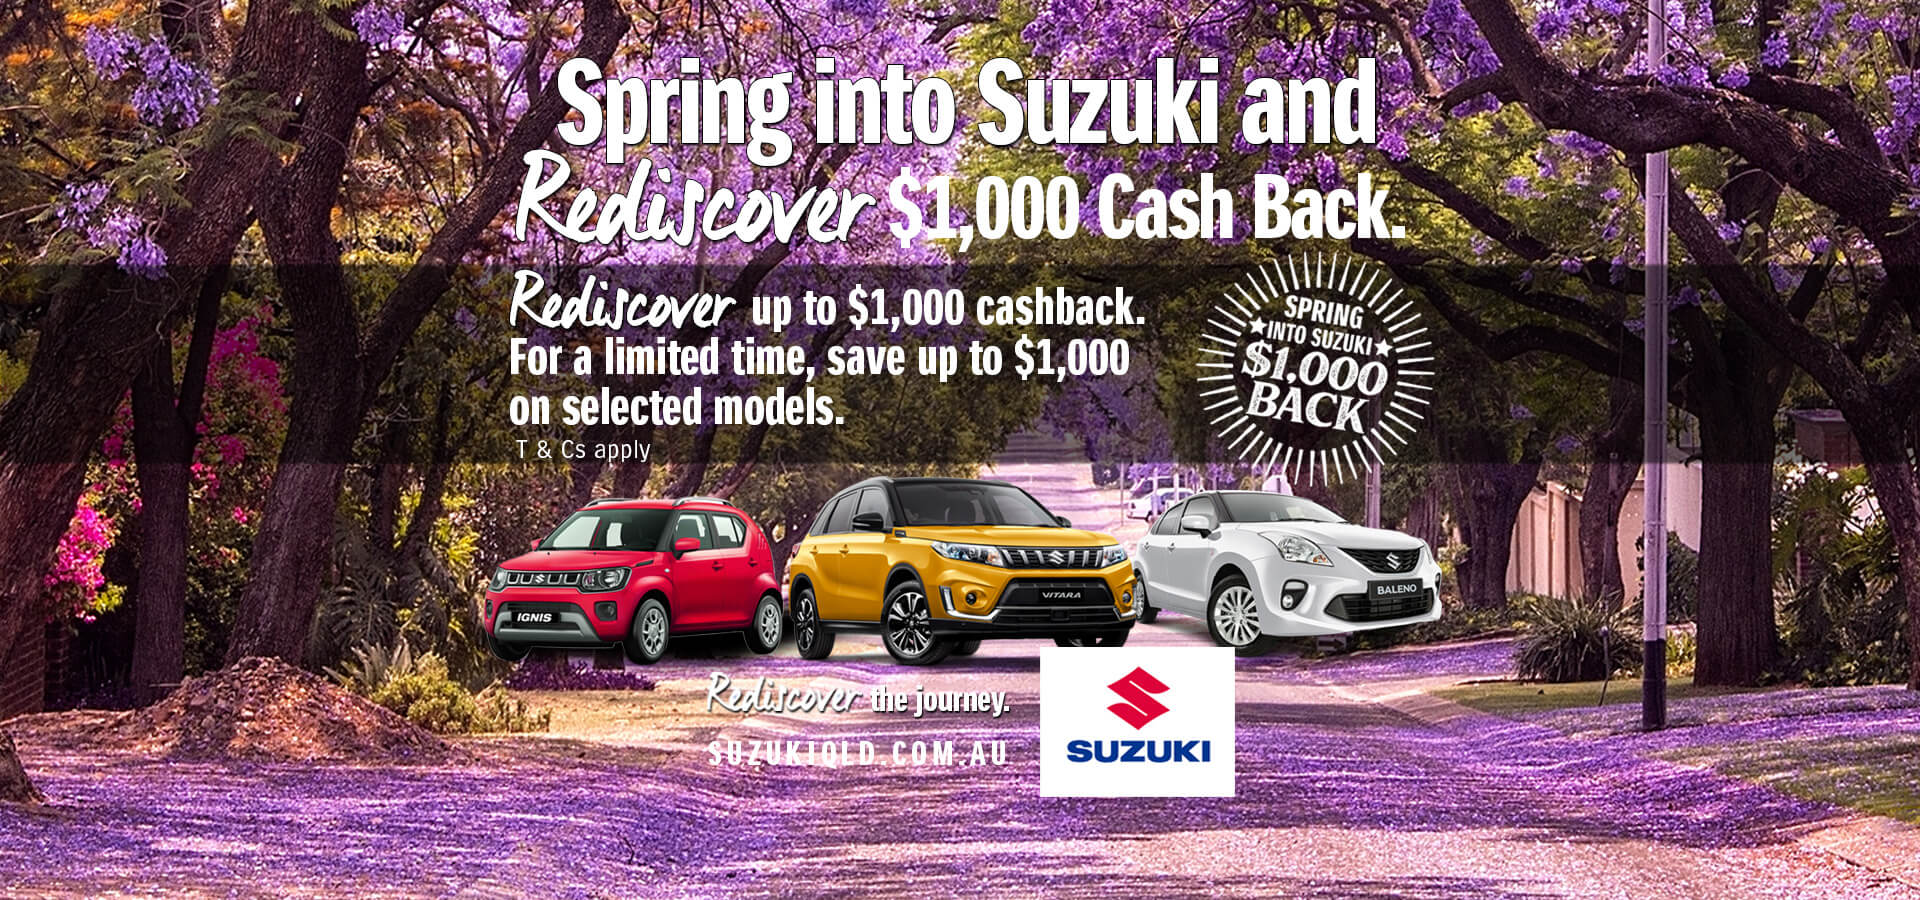 Spring into Suzuki and rediscover $1,000 Cash Back